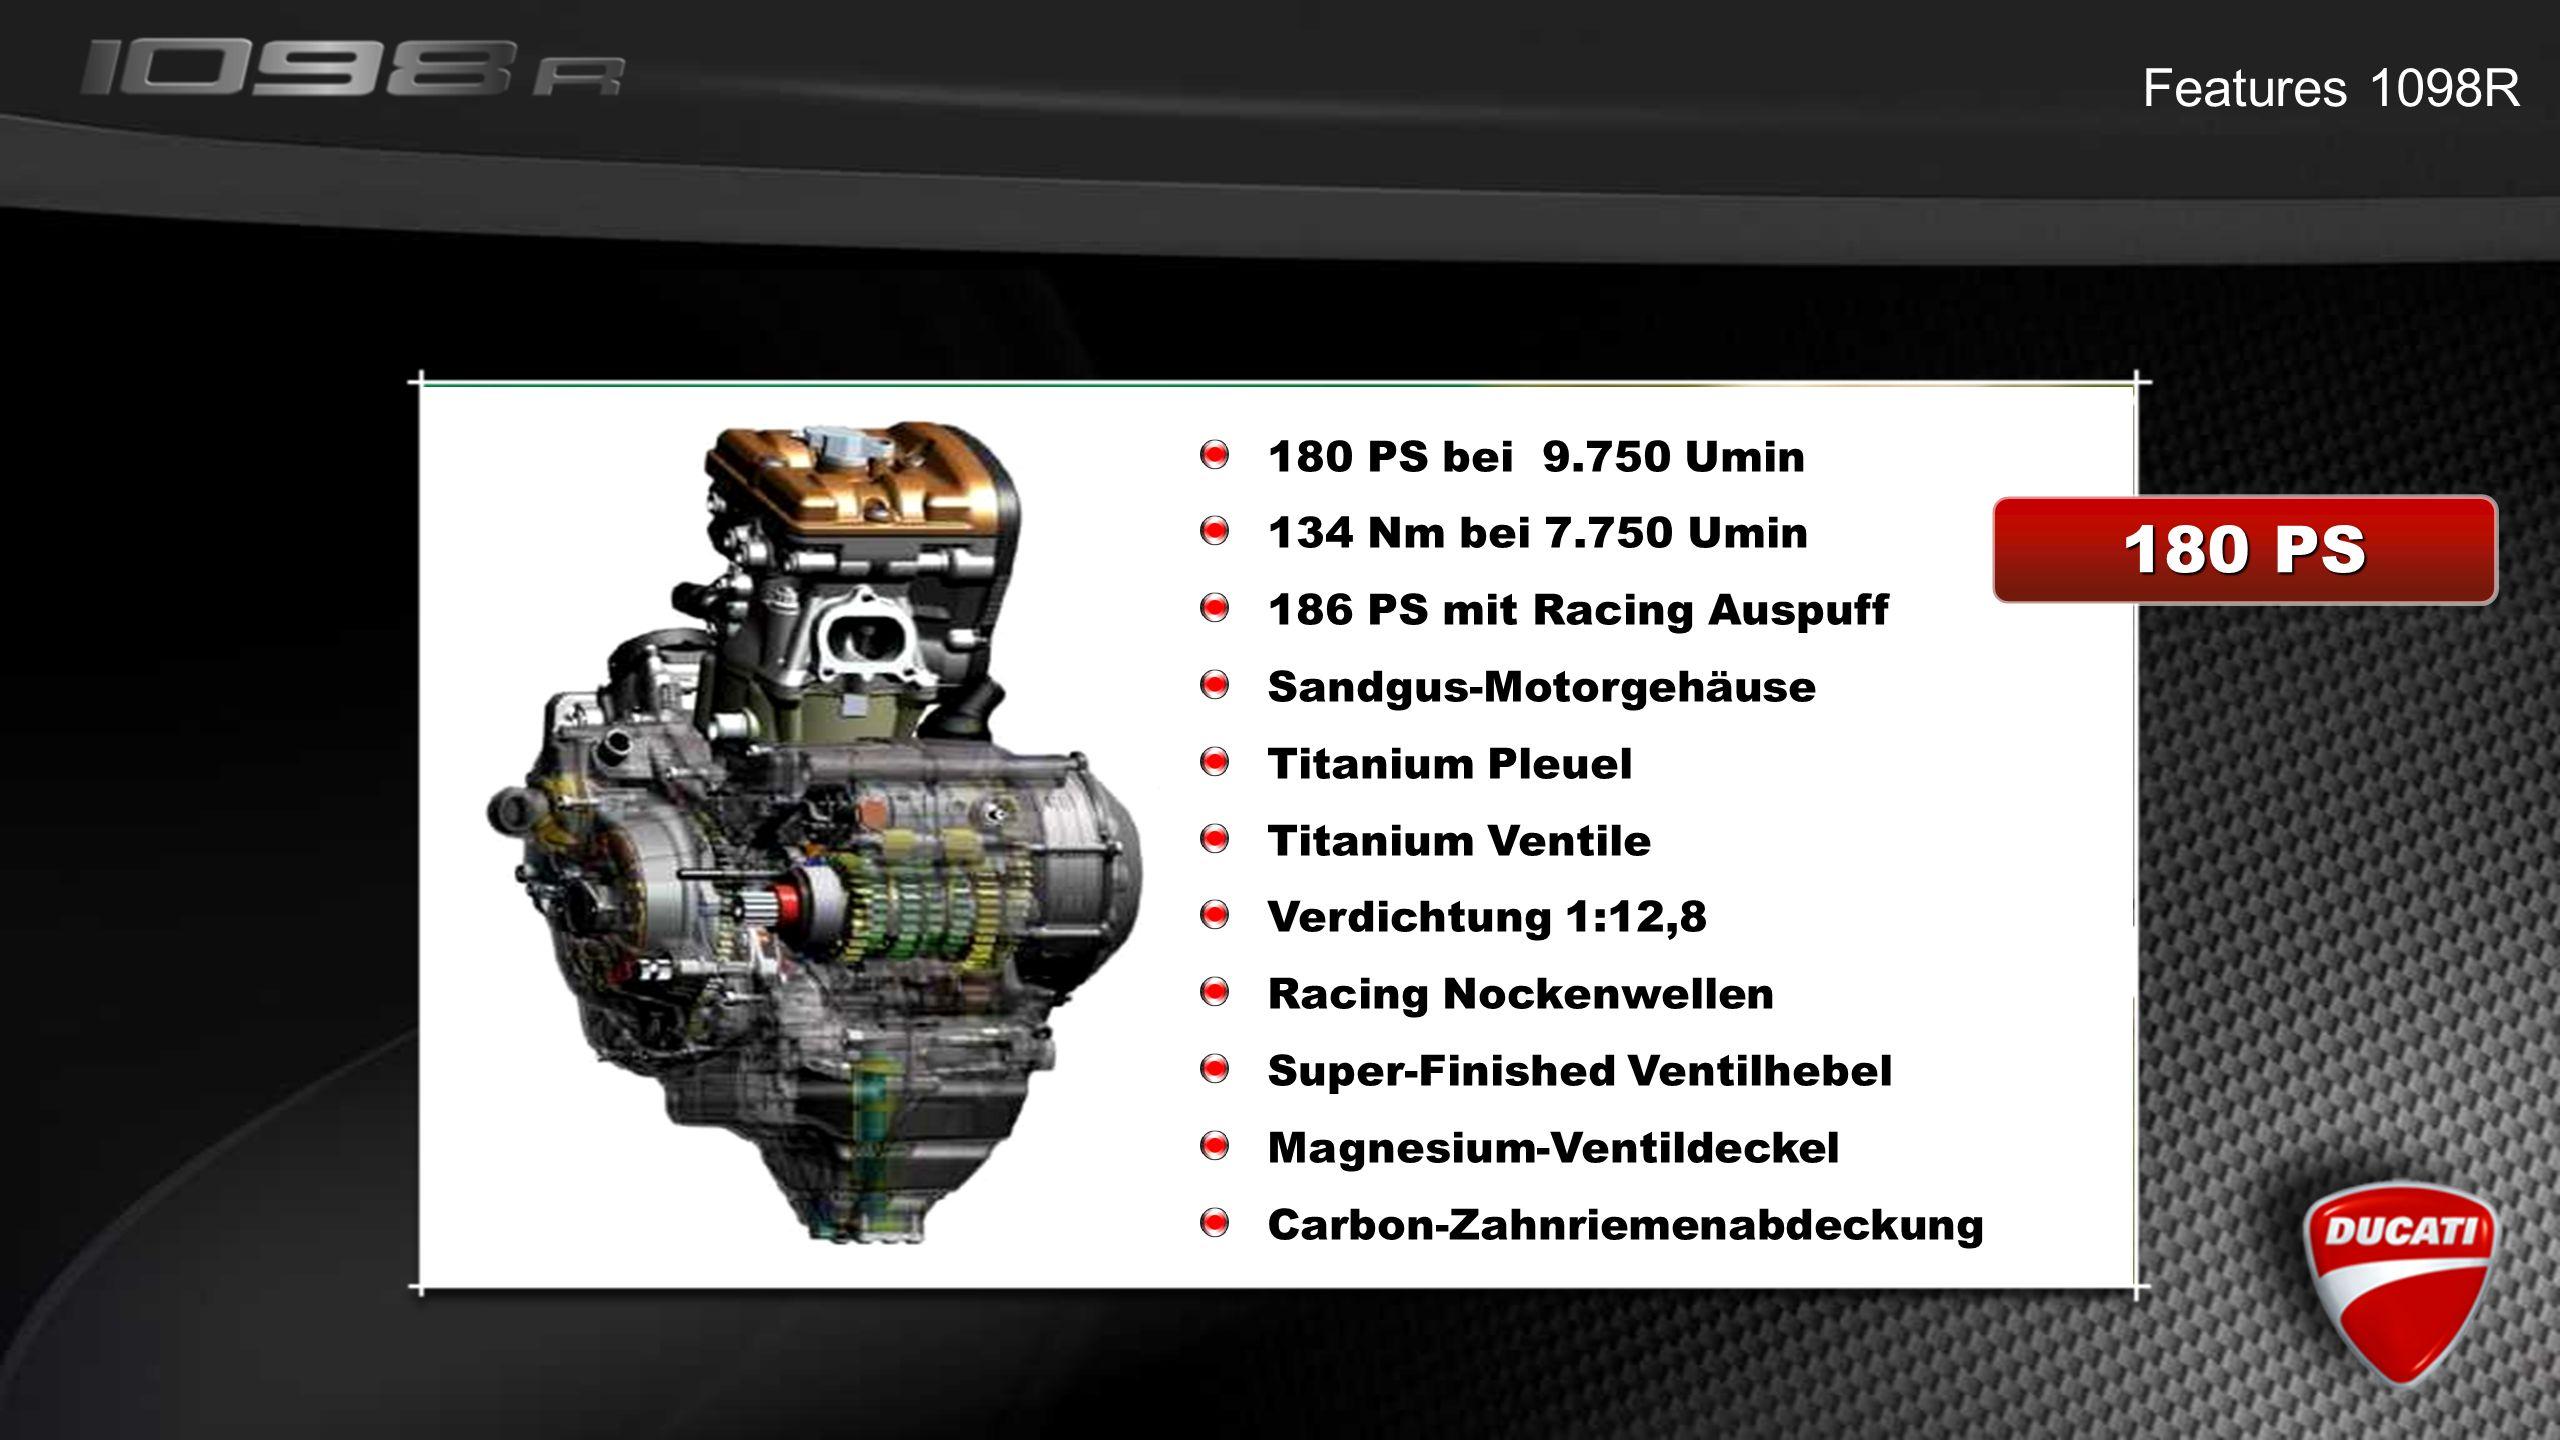 Features 1098R 180 PS 180 PS bei 9.750 Umin 134 Nm bei 7.750 Umin 186 PS mit Racing Auspuff Sandgus-Motorgehäuse Titanium Pleuel Titanium Ventile Verdichtung 1:12,8 Racing Nockenwellen Super-Finished Ventilhebel Magnesium-Ventildeckel Carbon-Zahnriemenabdeckung